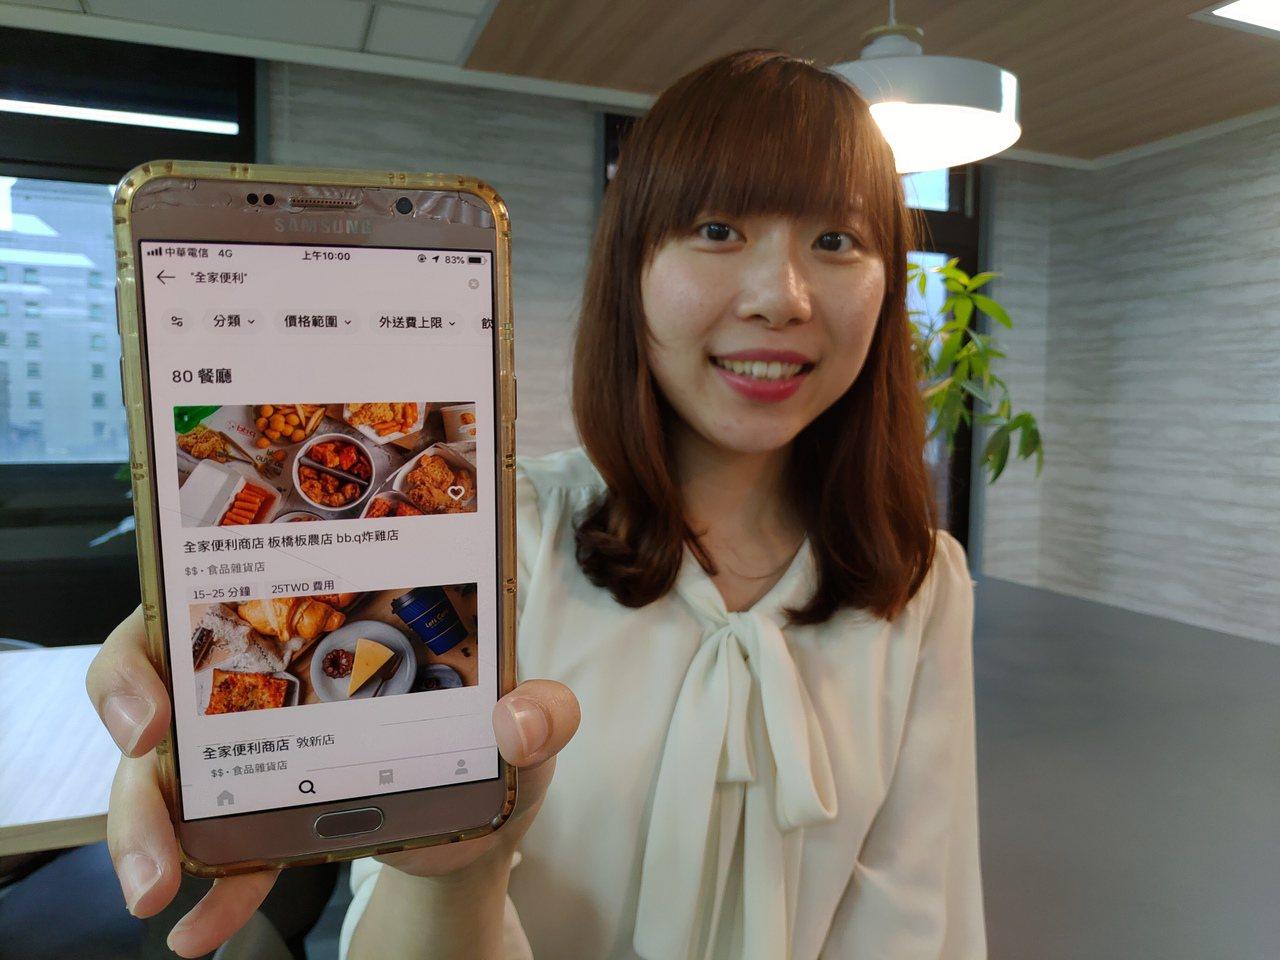 Uber Eats「全家專區」鮮食約30個品項,包含早午餐促鮮食、bb.q CH...